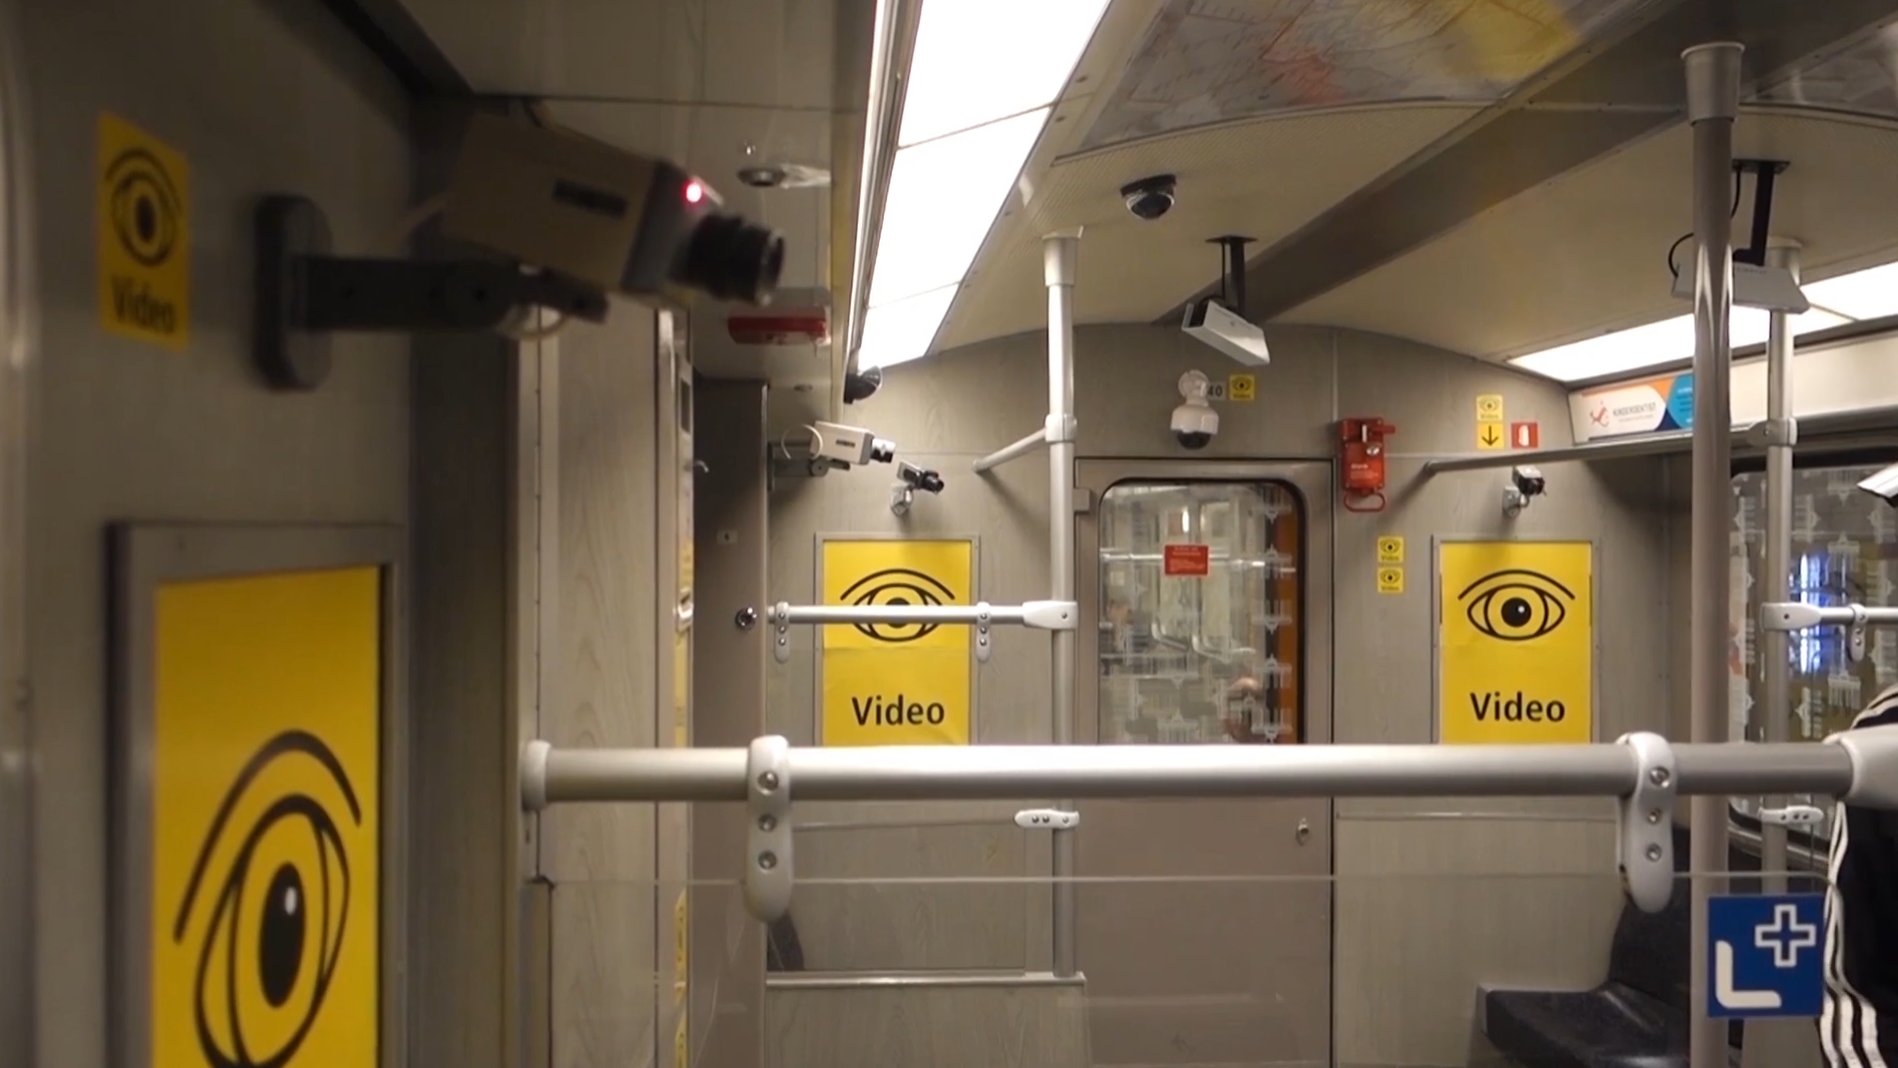 """Big Brother is watching you!"" - Kunstaktion in Berliner U-Bahn"